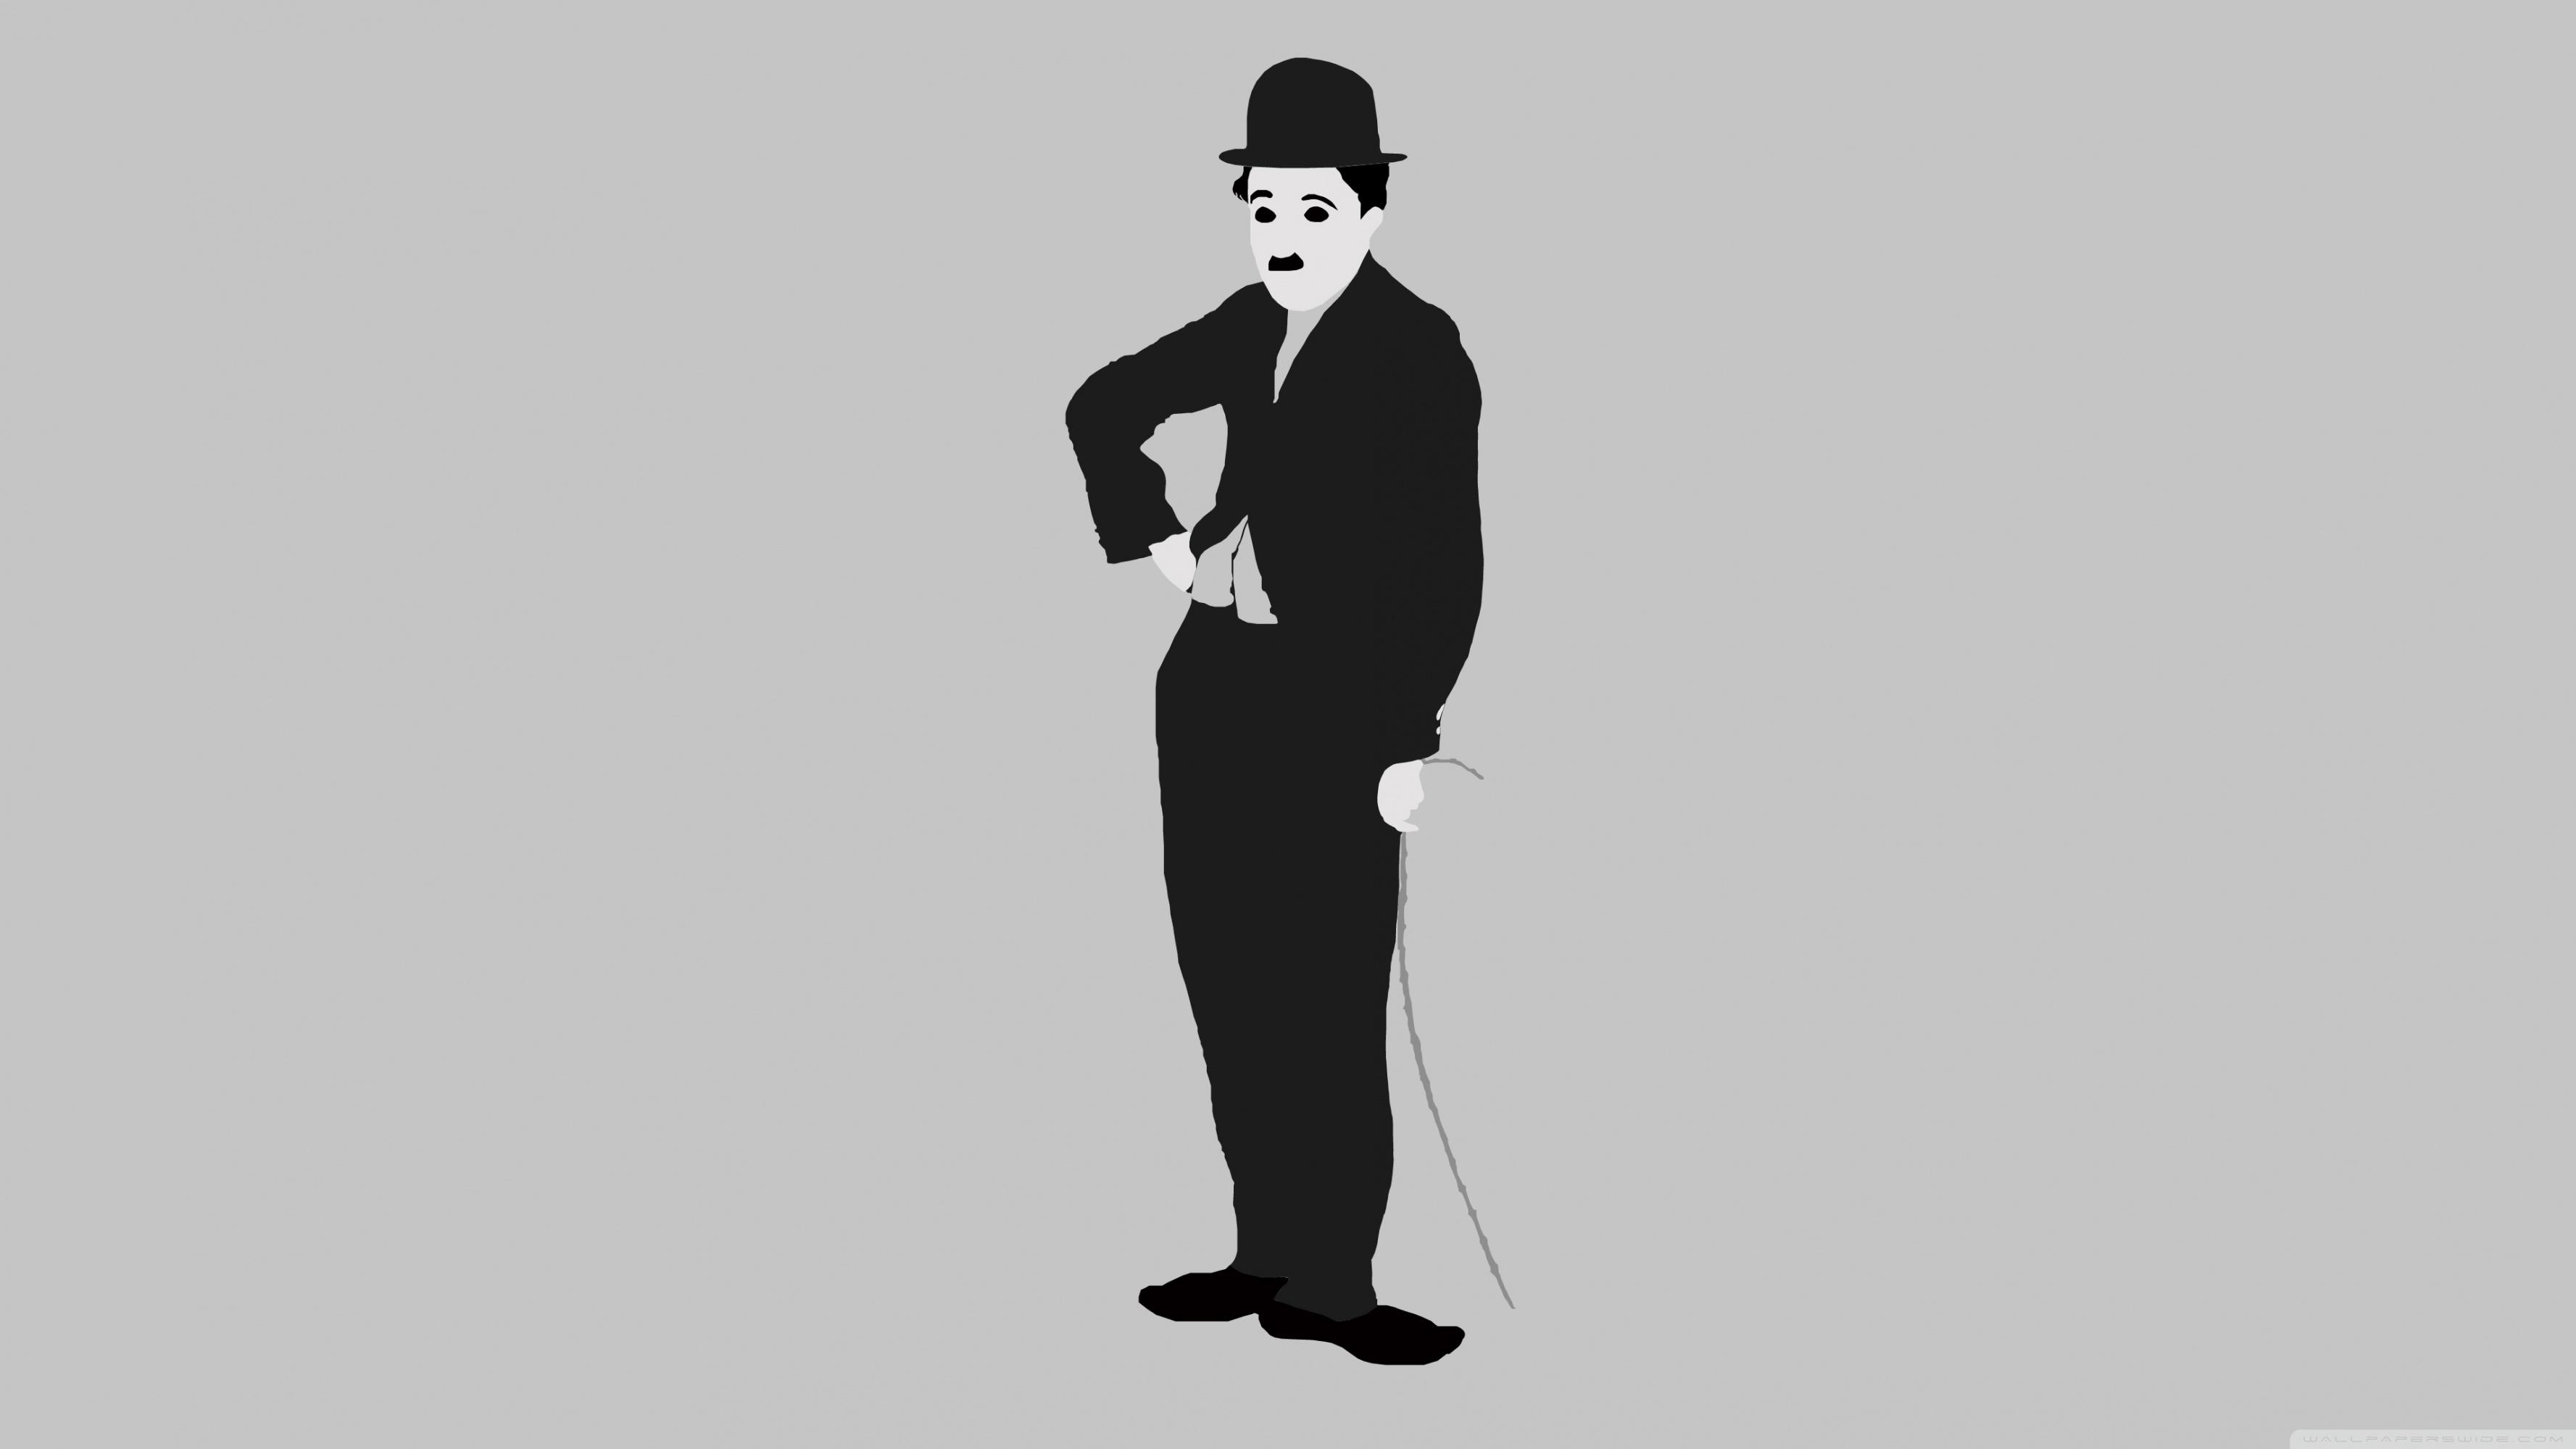 Charlie Chaplin 4K HD Desktop Wallpaper for 4K Ultra HD TV 3554x1999